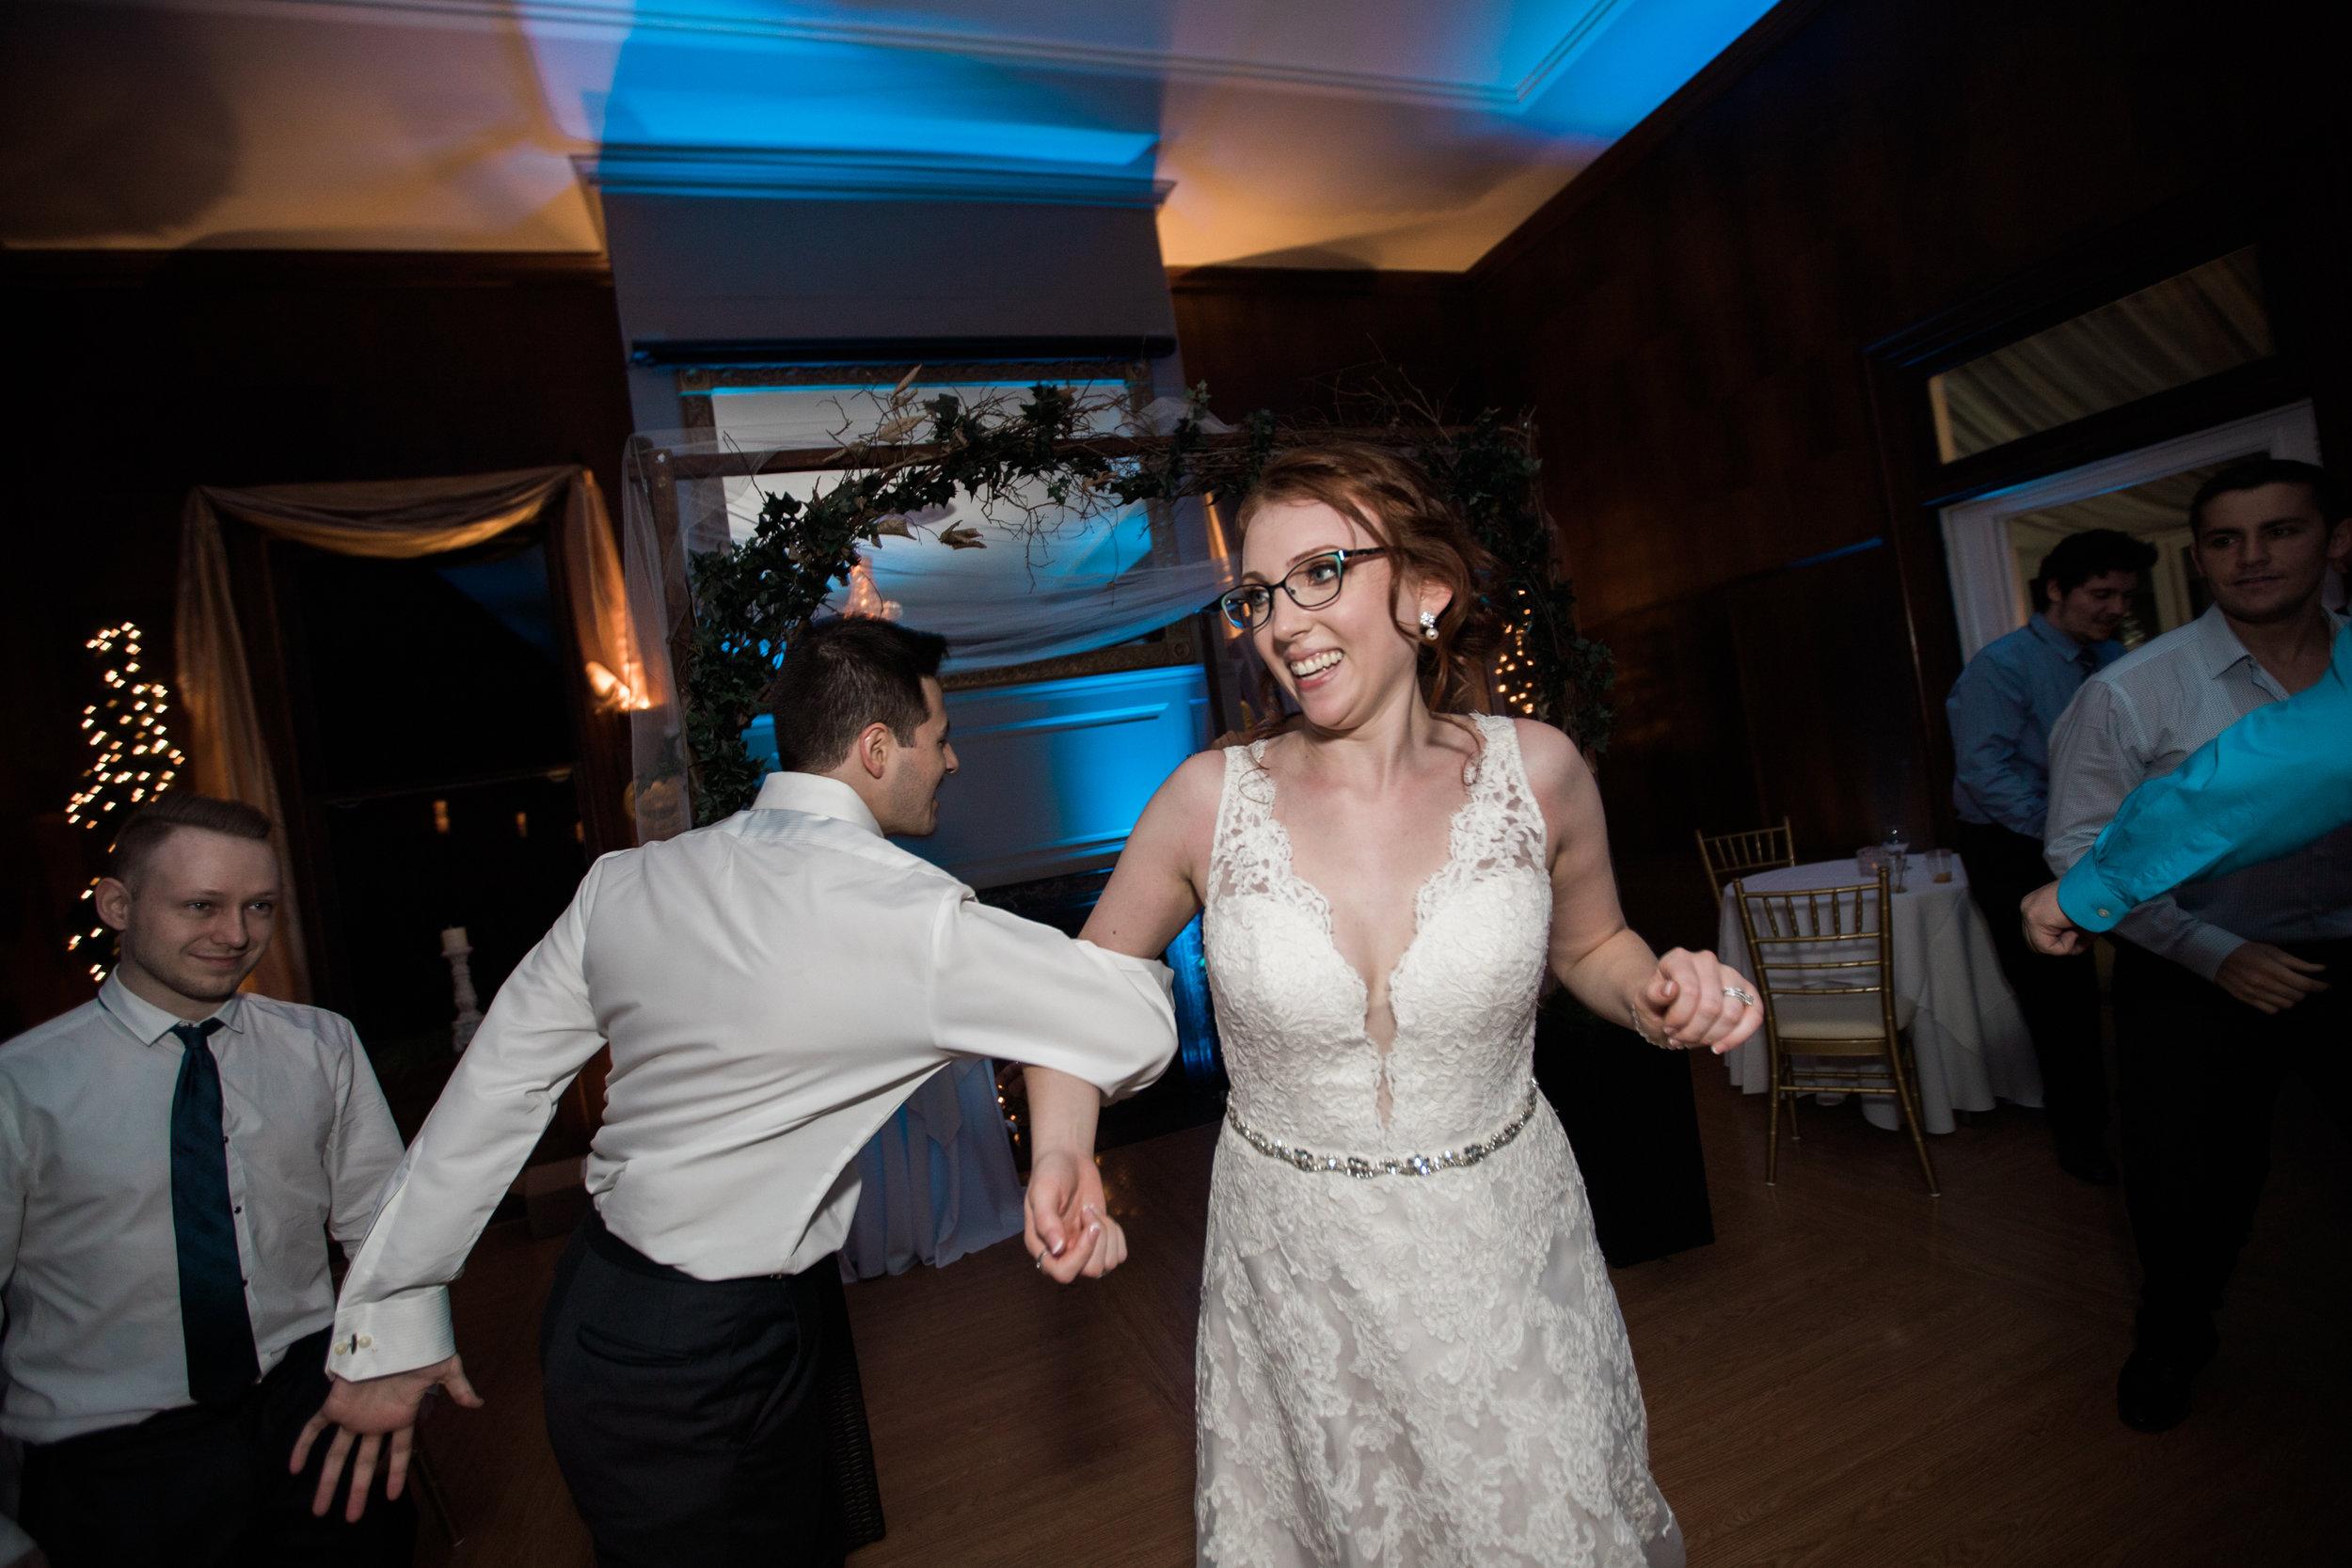 Harry Potter Wedding at Overhills Mansion Catonville Maryland Wedding Photographers Megapixels Media (127 of 134).jpg